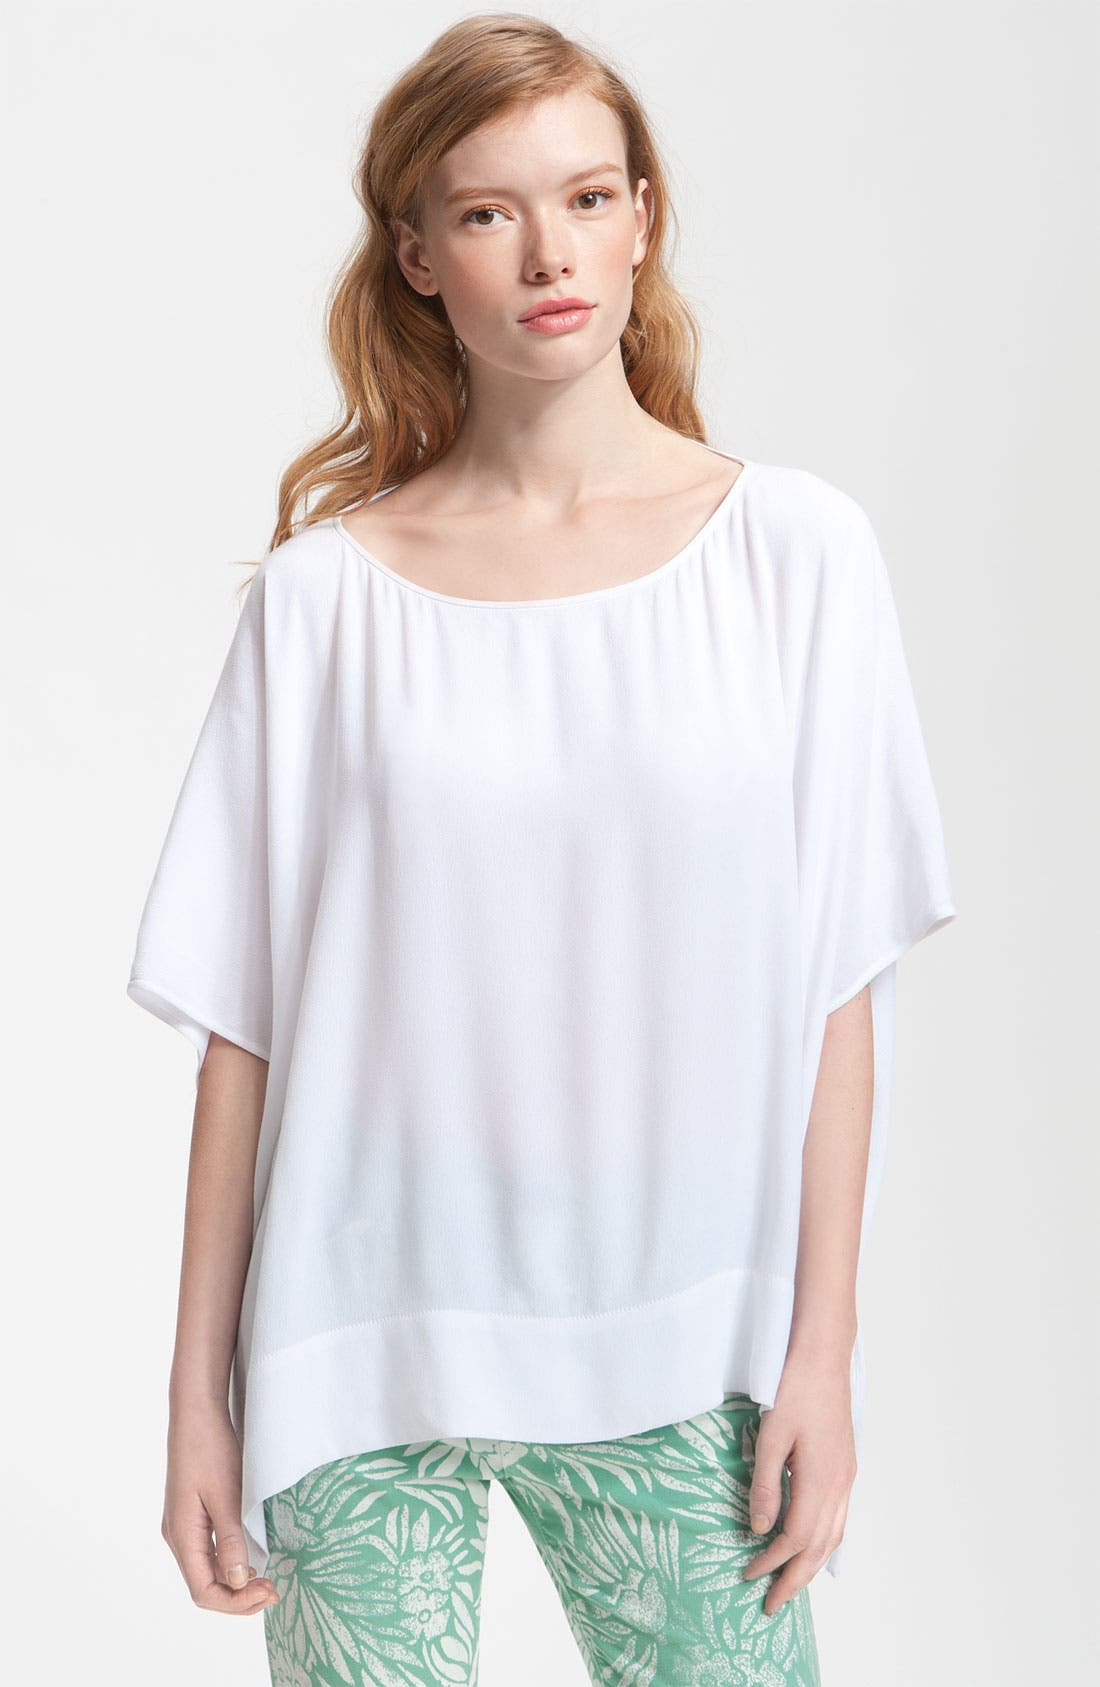 Alternate Image 1 Selected - Diane von Furstenberg 'New Hanky' Asymmetrical Hem Top